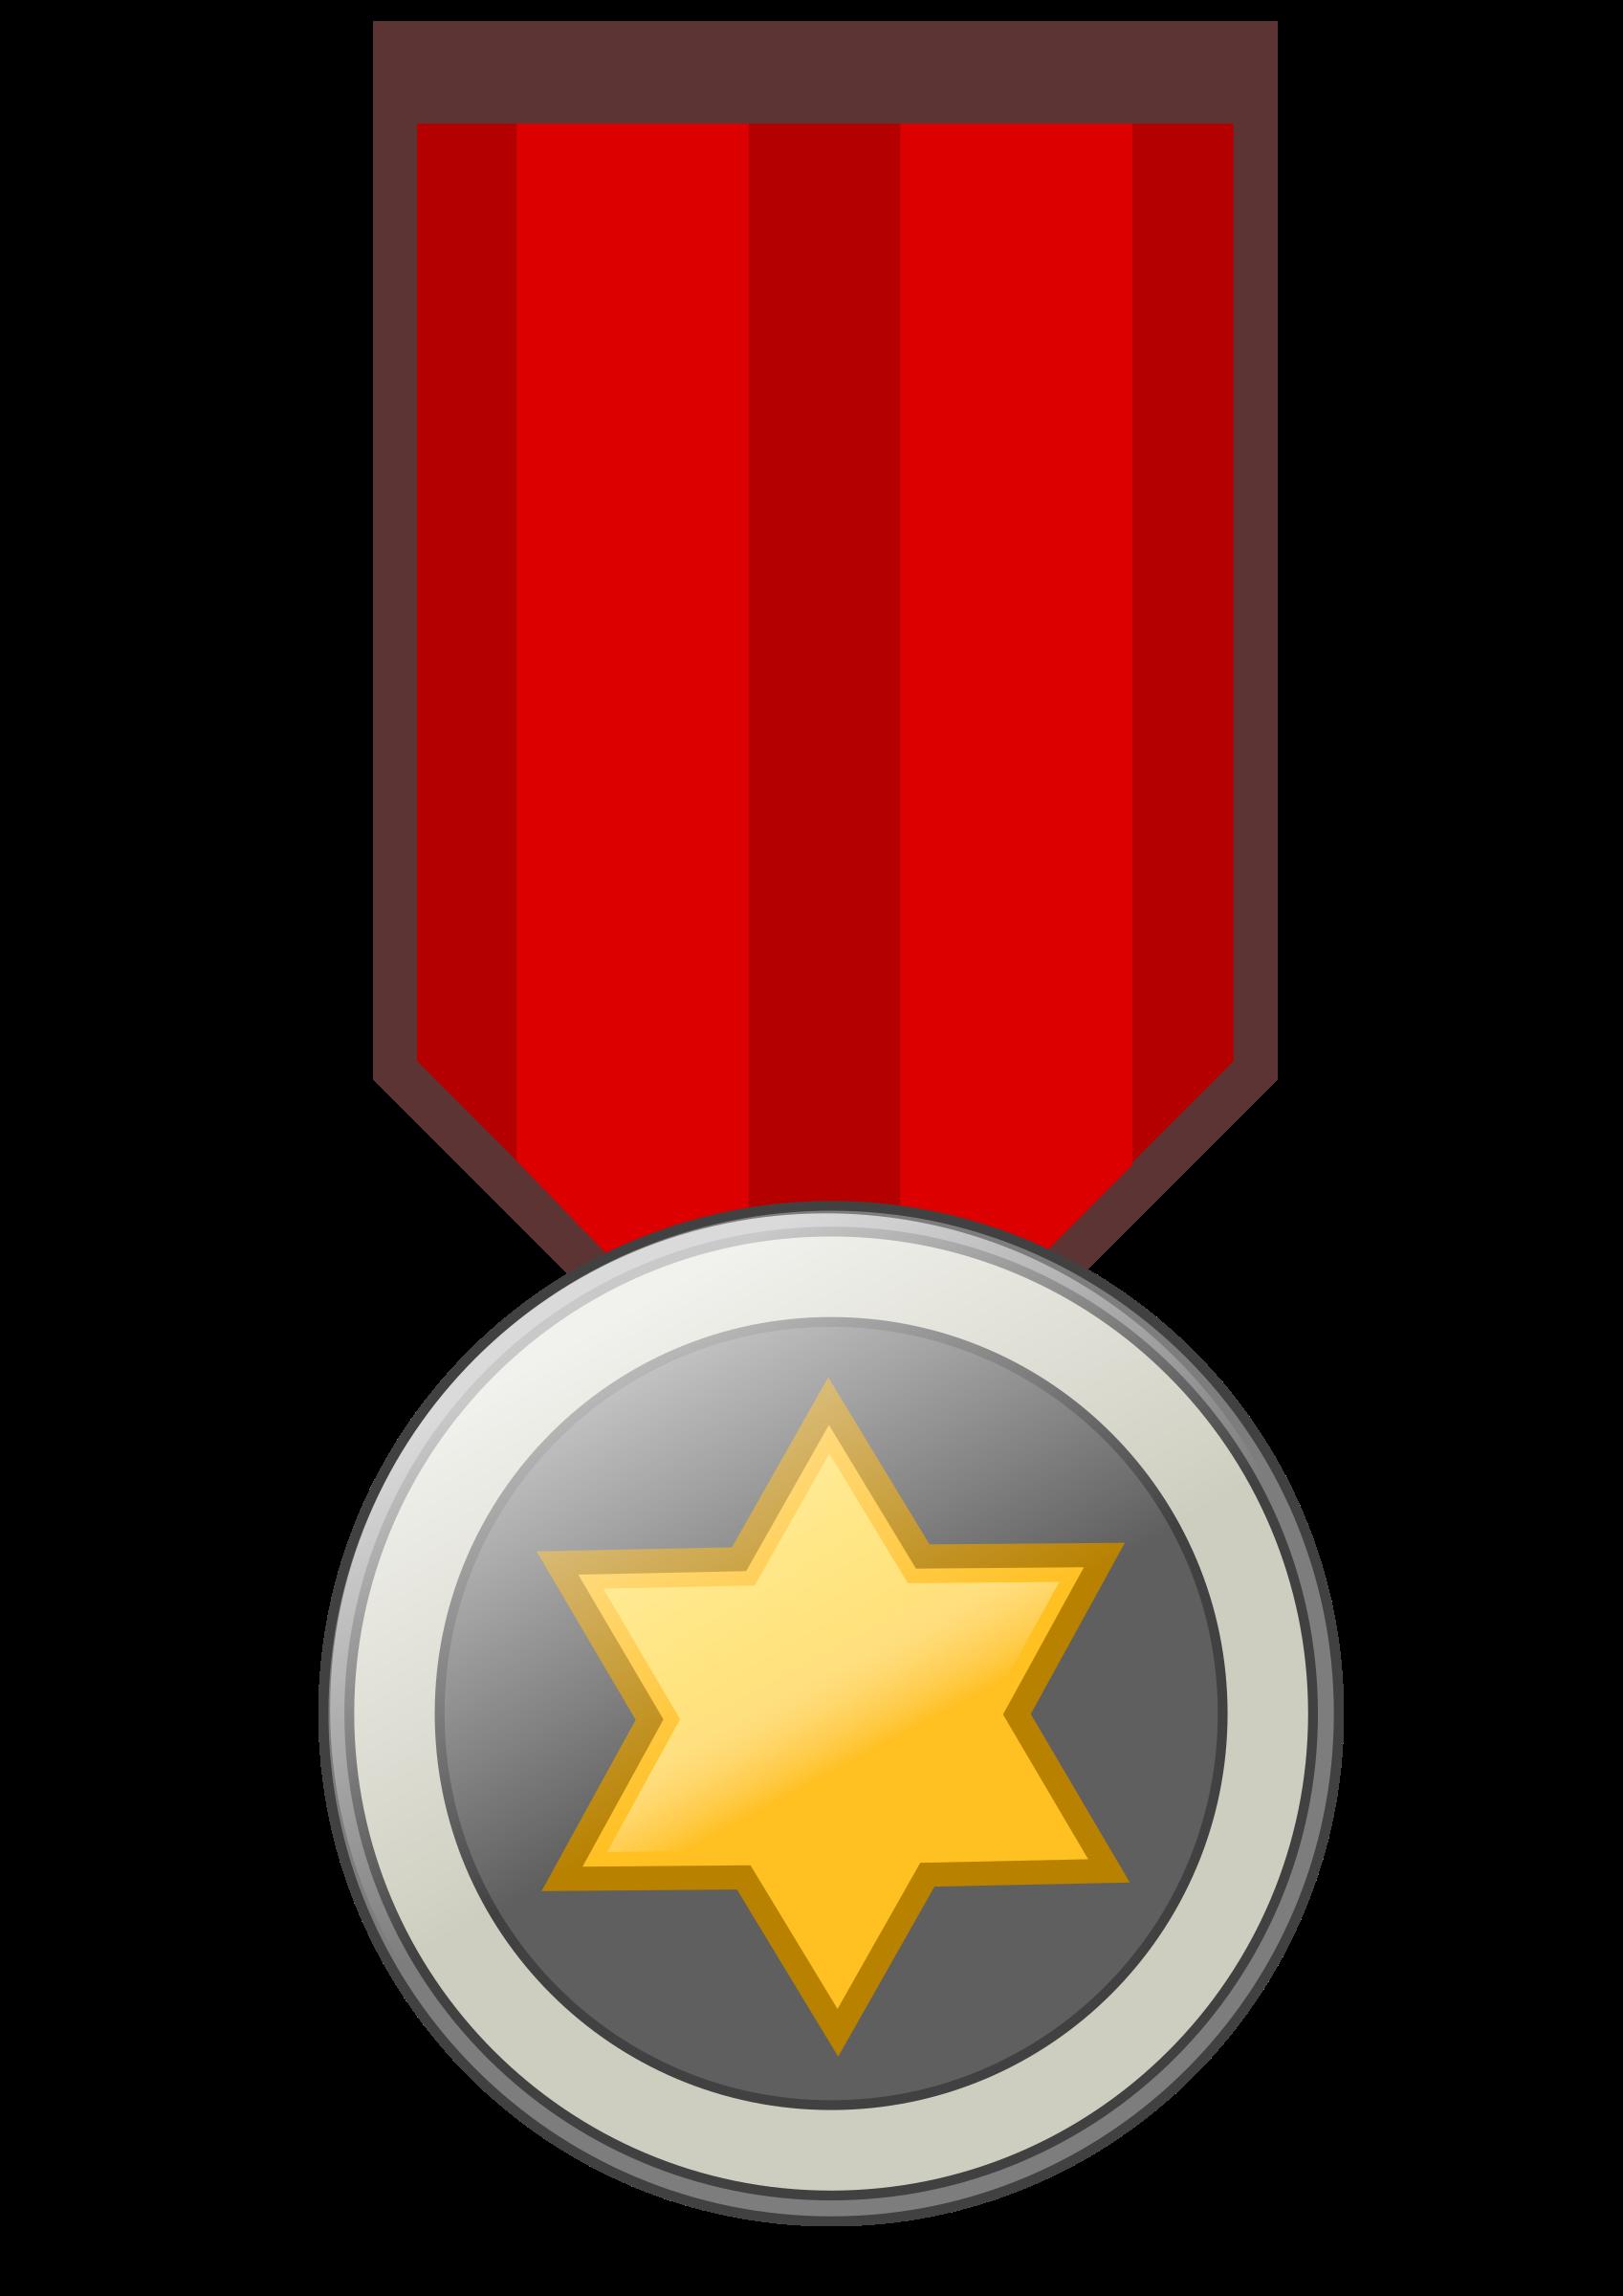 Star medal clipart image download Clipart - Star award medal remix badge image download